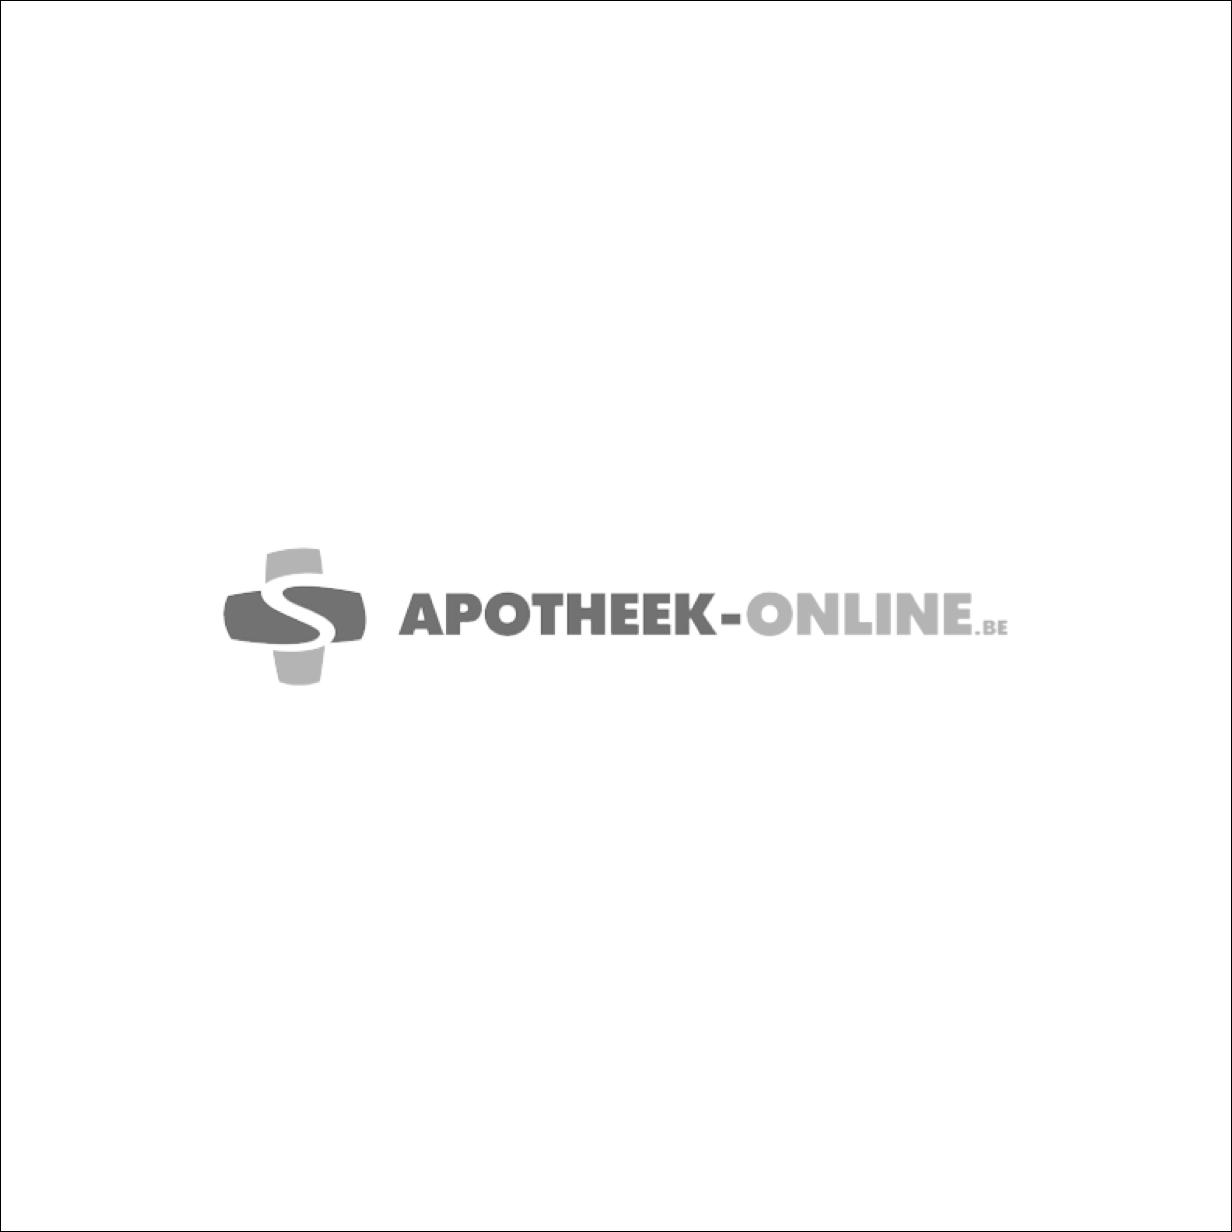 ULTRAMEAL CHOCOLAT PDR 630G 78 METAGENICS